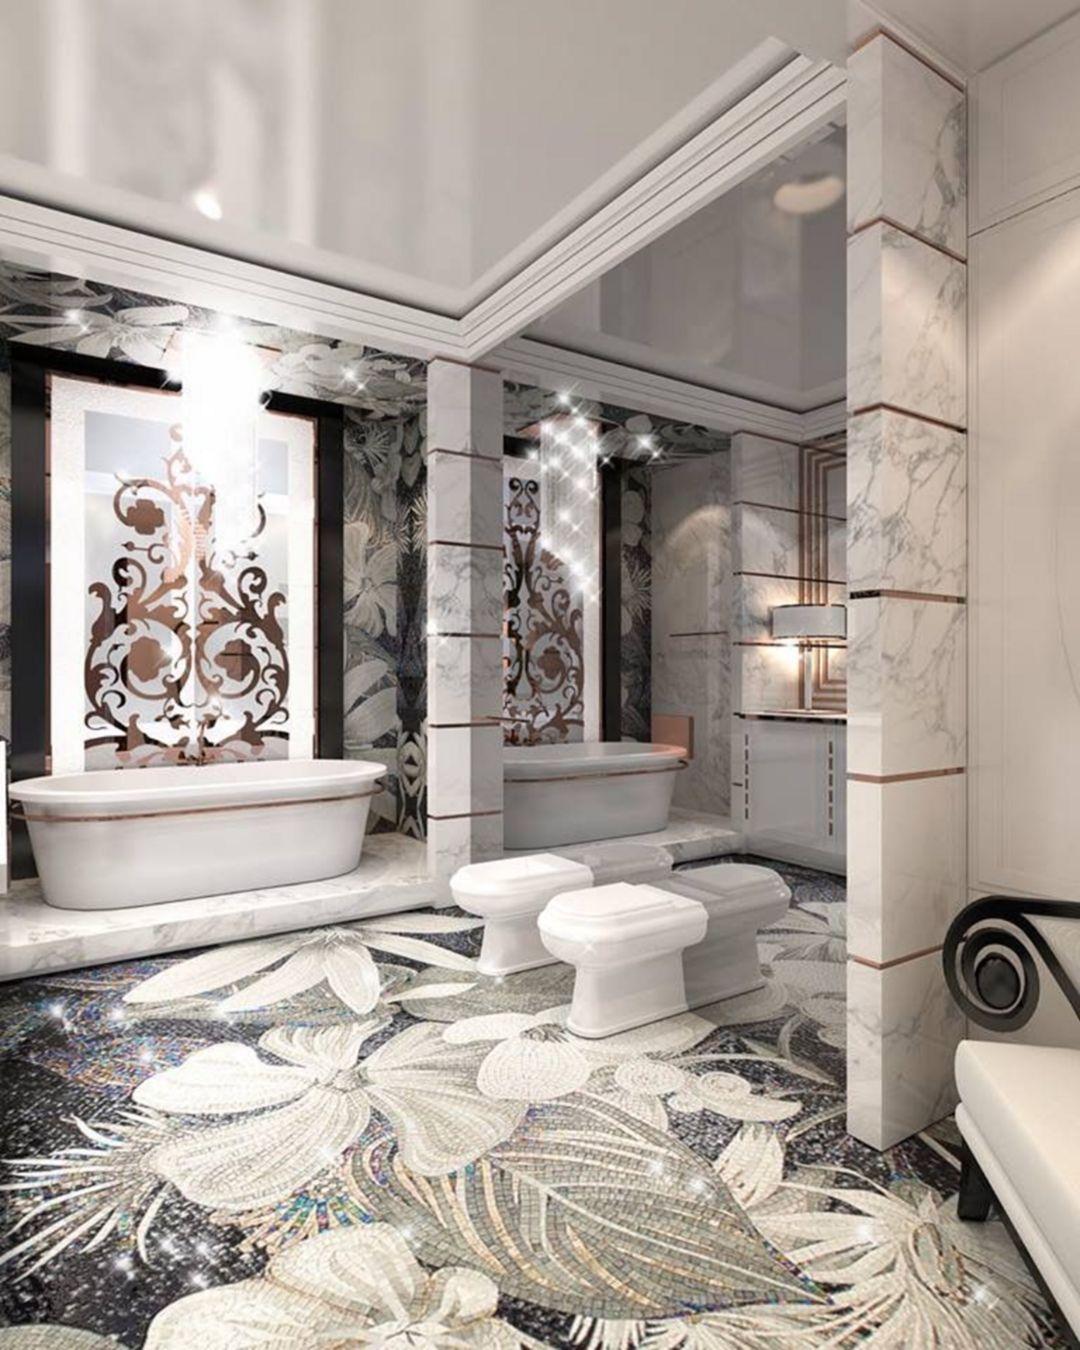 30 Glamorous Bathroom Design Ideas You Never Seen Before Luxury Bathroom Glamorous Bathroom Bathroom Design